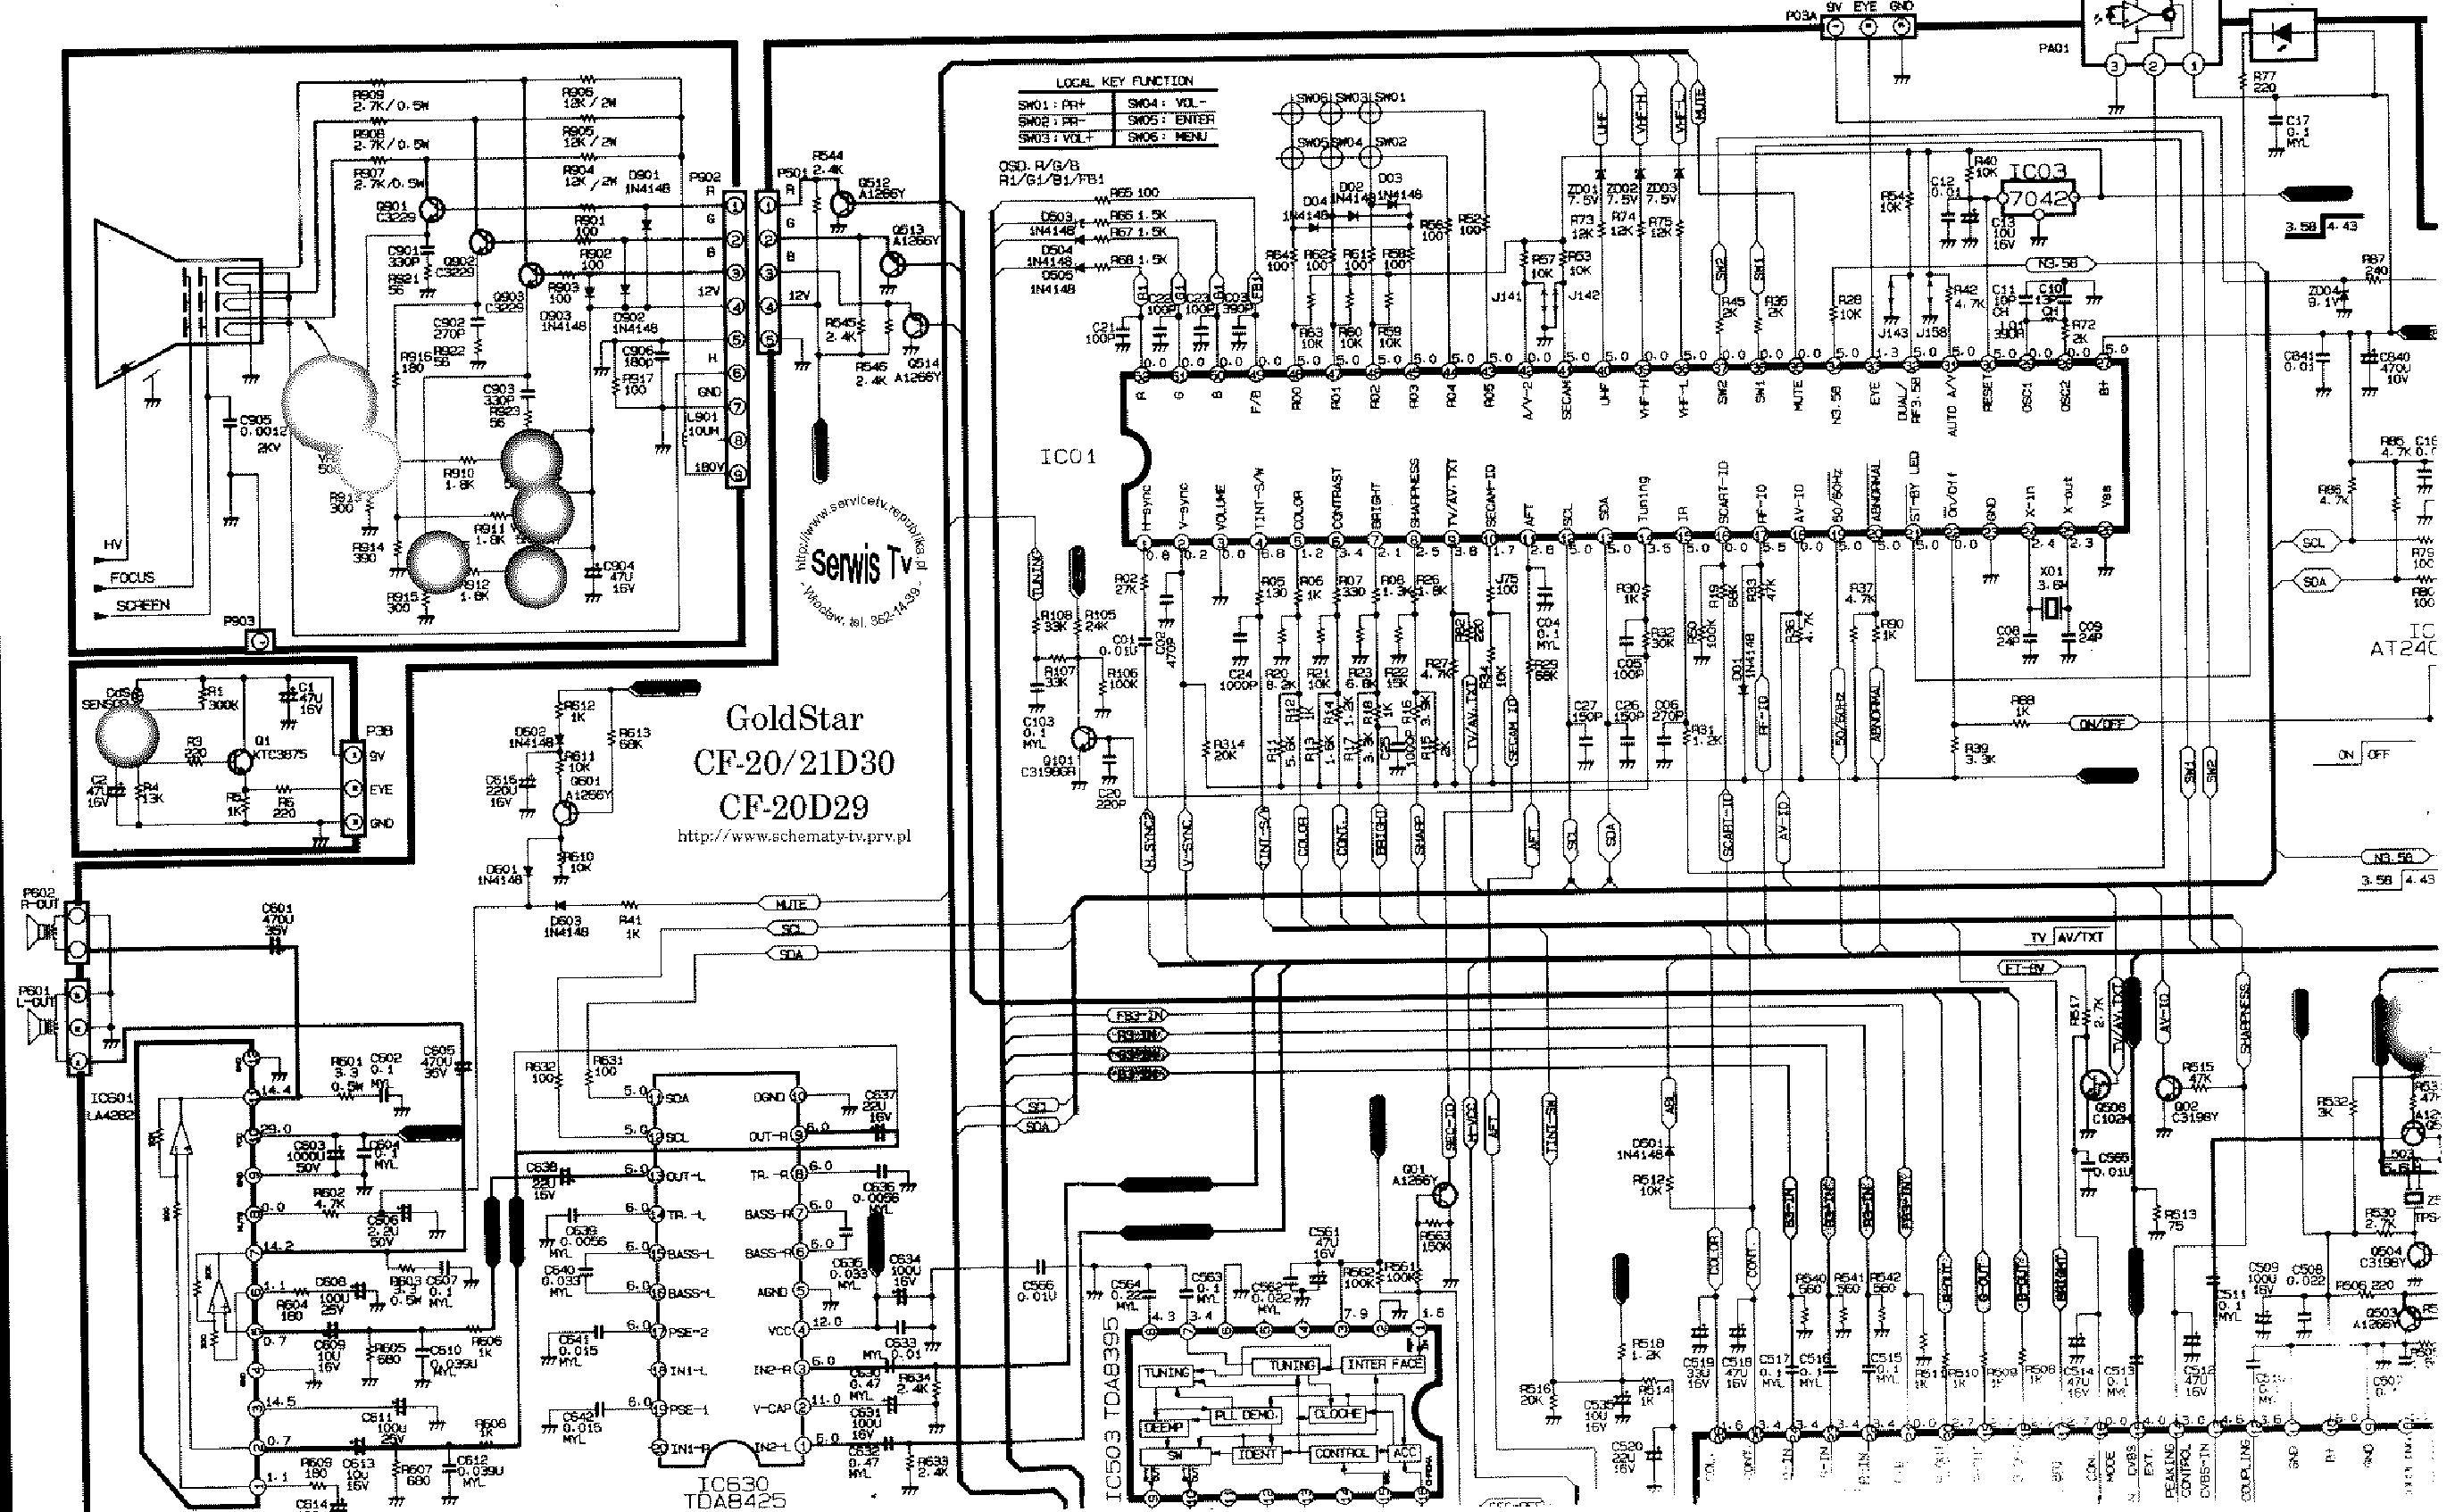 LG GOLDSTAR CHASSIS MC-64B CF-20D30 CF-20D29 service manual (1st